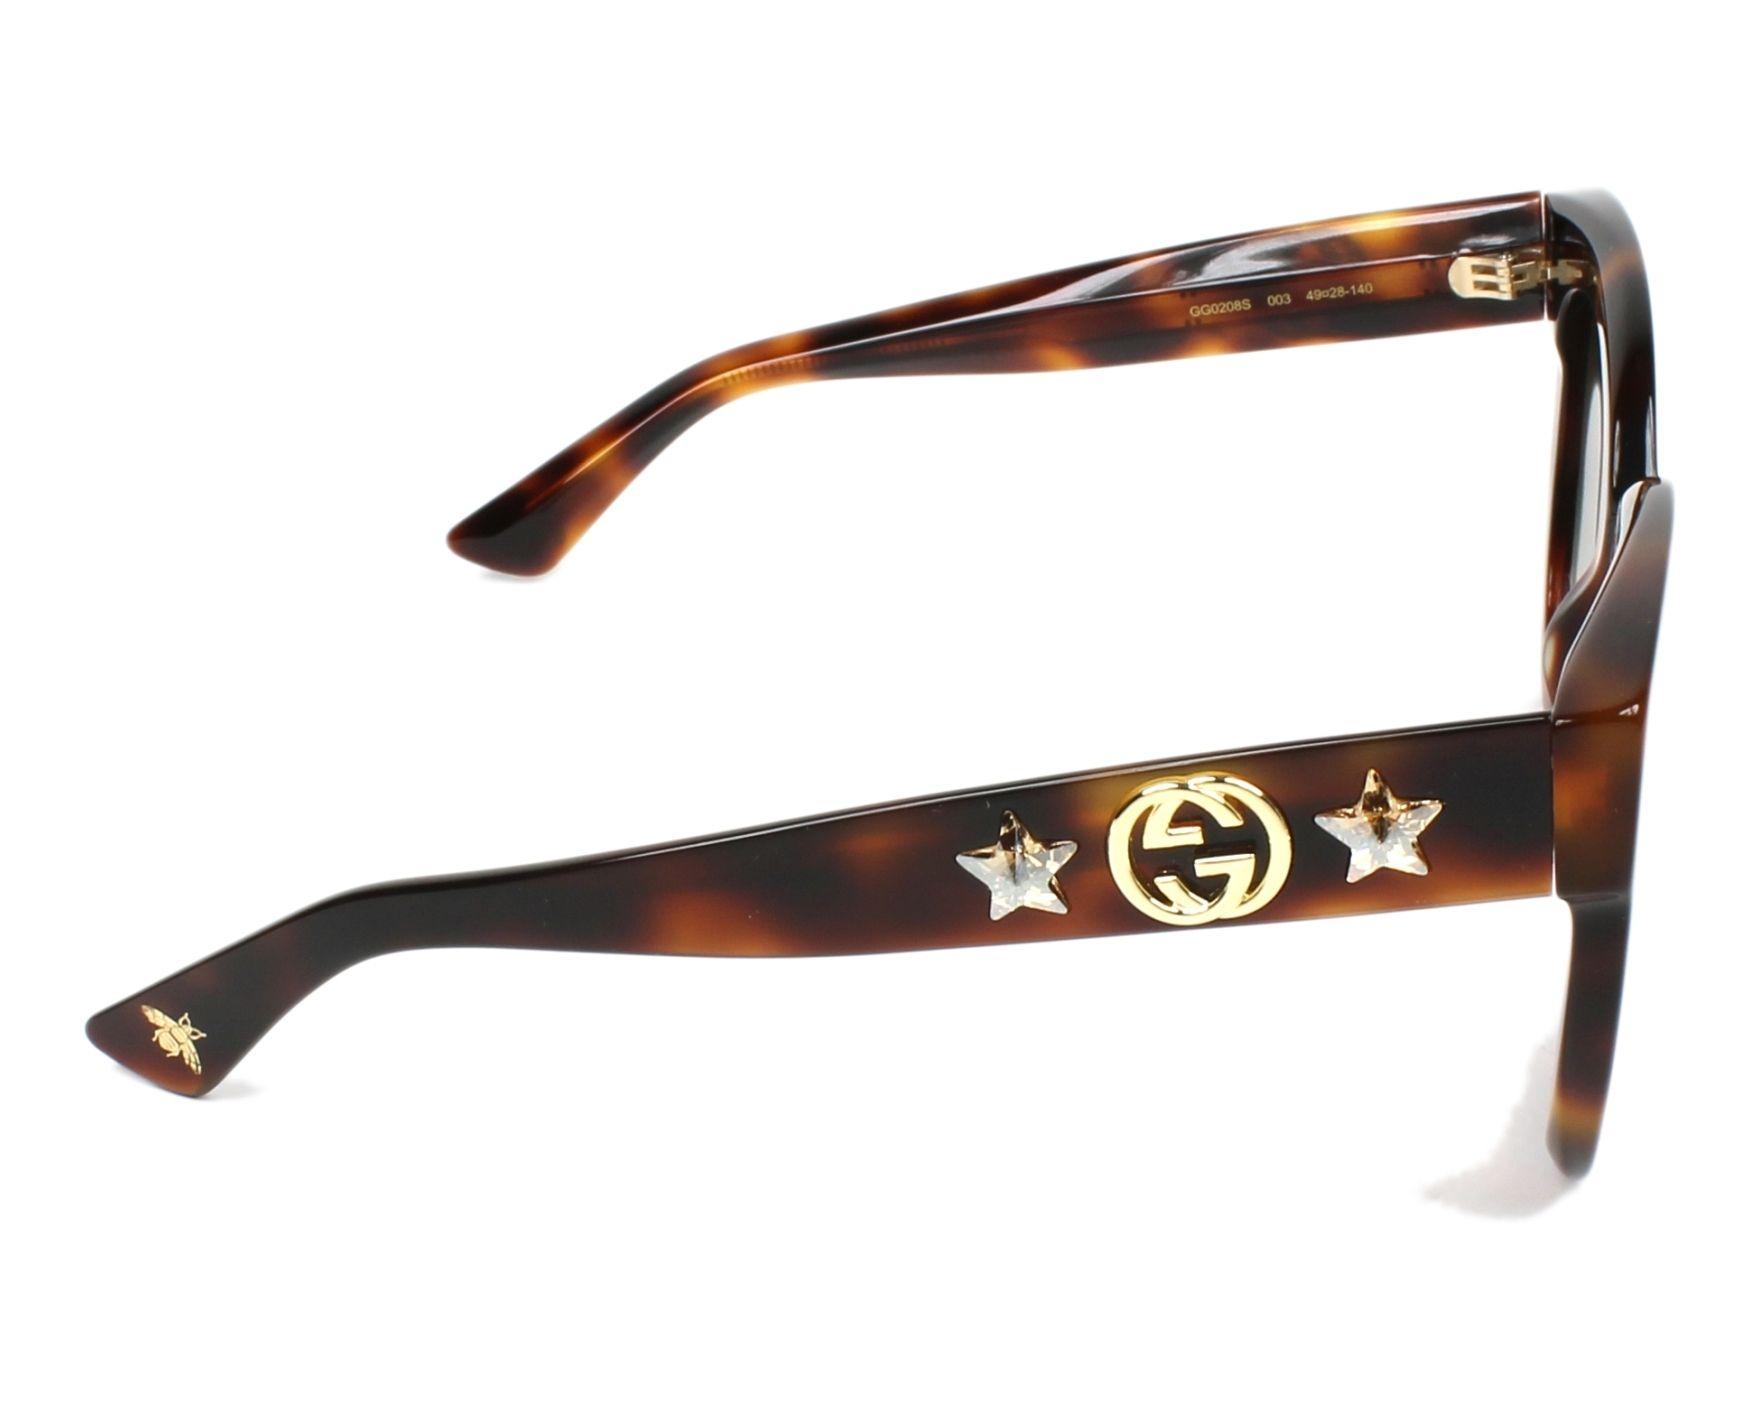 c9cf891d58f Sunglasses Gucci GG-0208-S 003 49-25 Havana side view